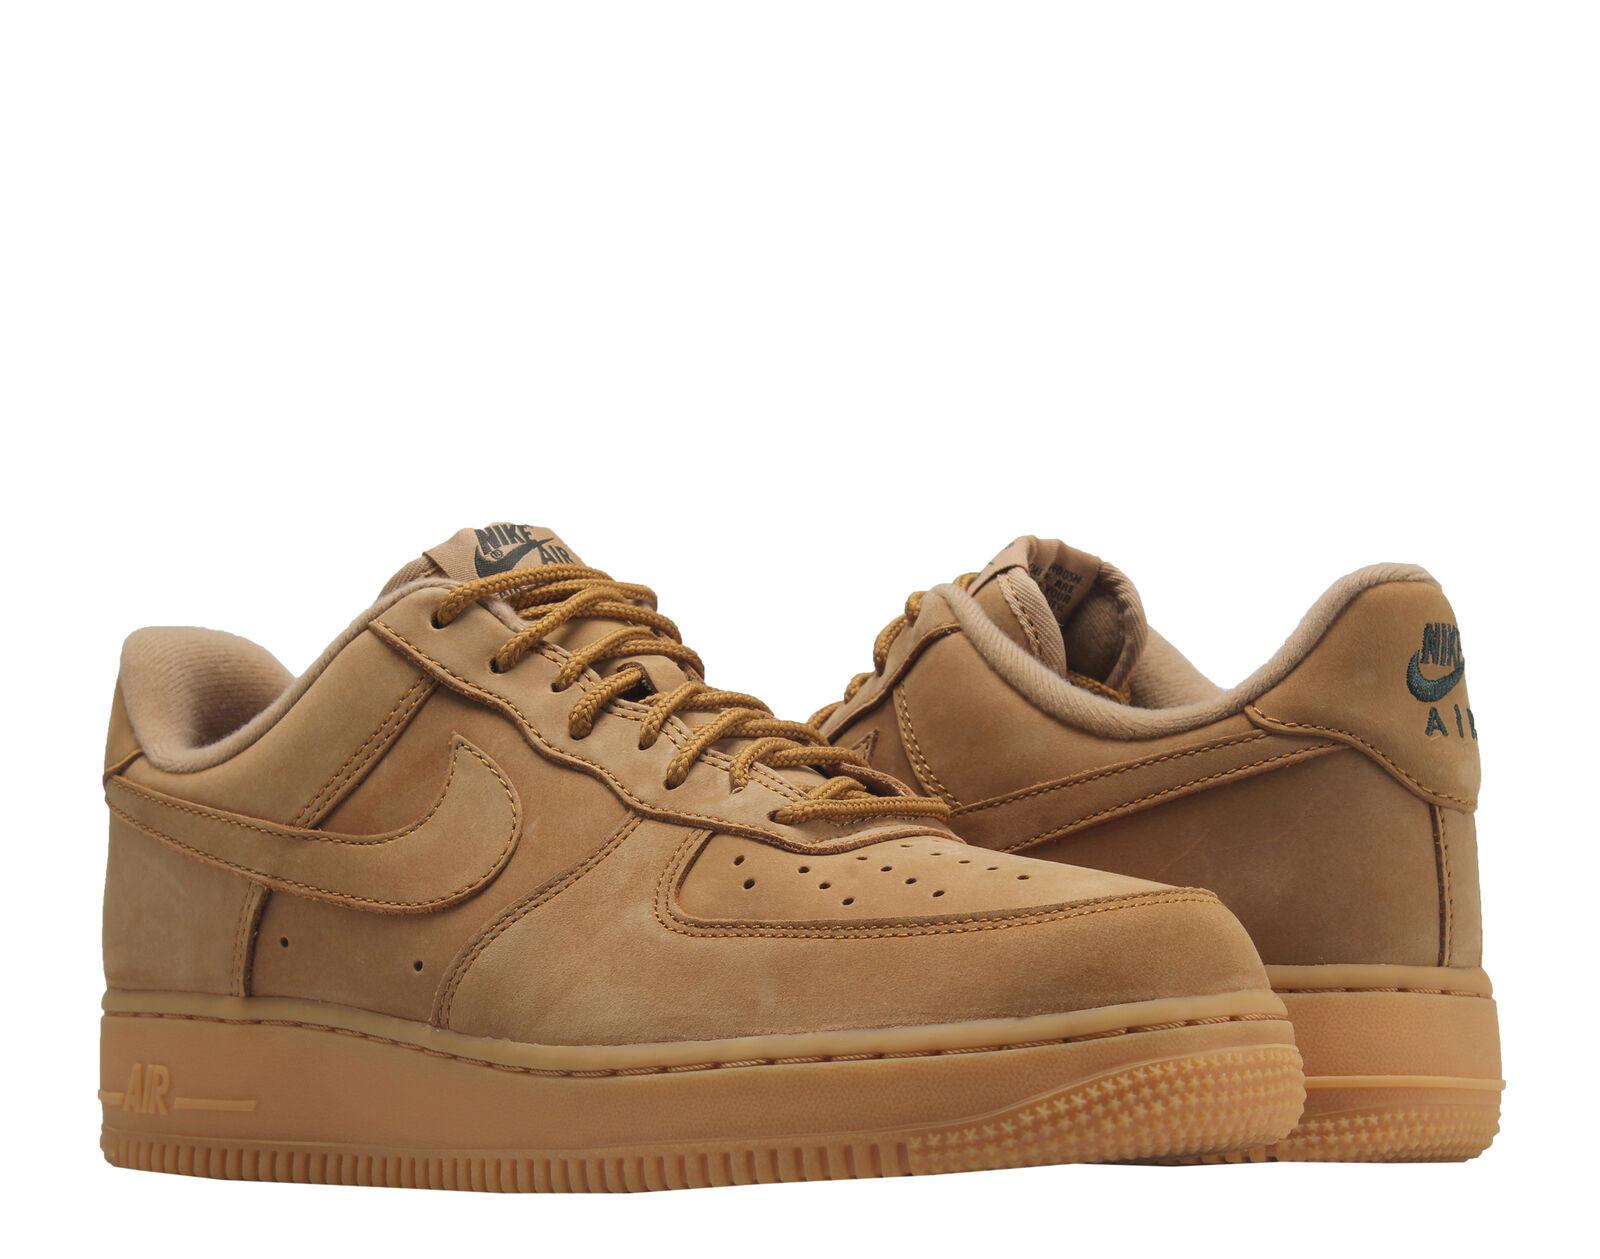 Nike air force 1 '07 wb lino / lino gomma grano uomini scarpe da basket aa4061-200